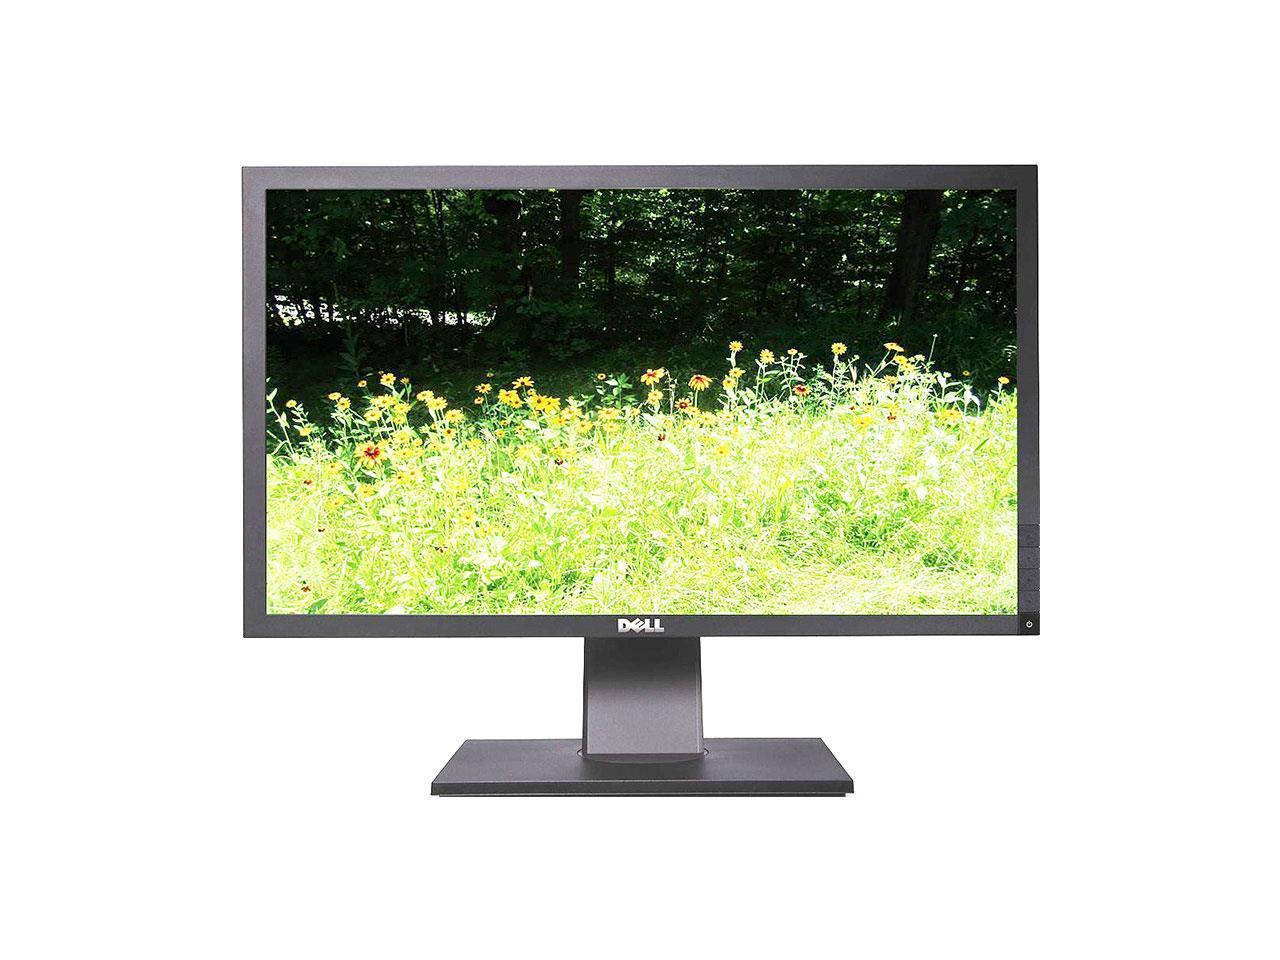 DELL P2411HB 24 Inch Full HD LED